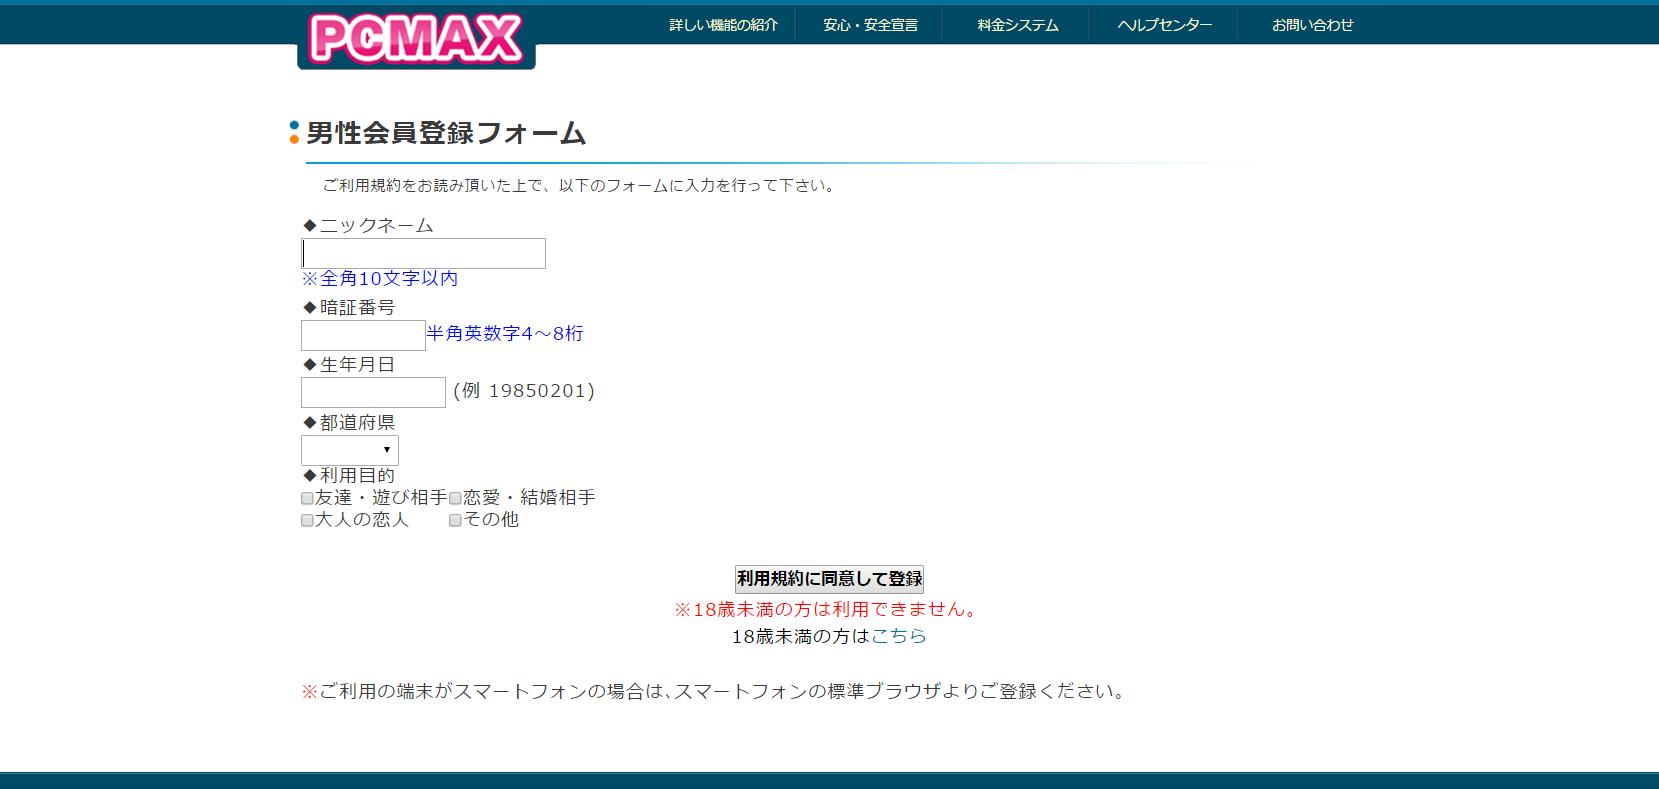 PCMAX登録 登録フォーム